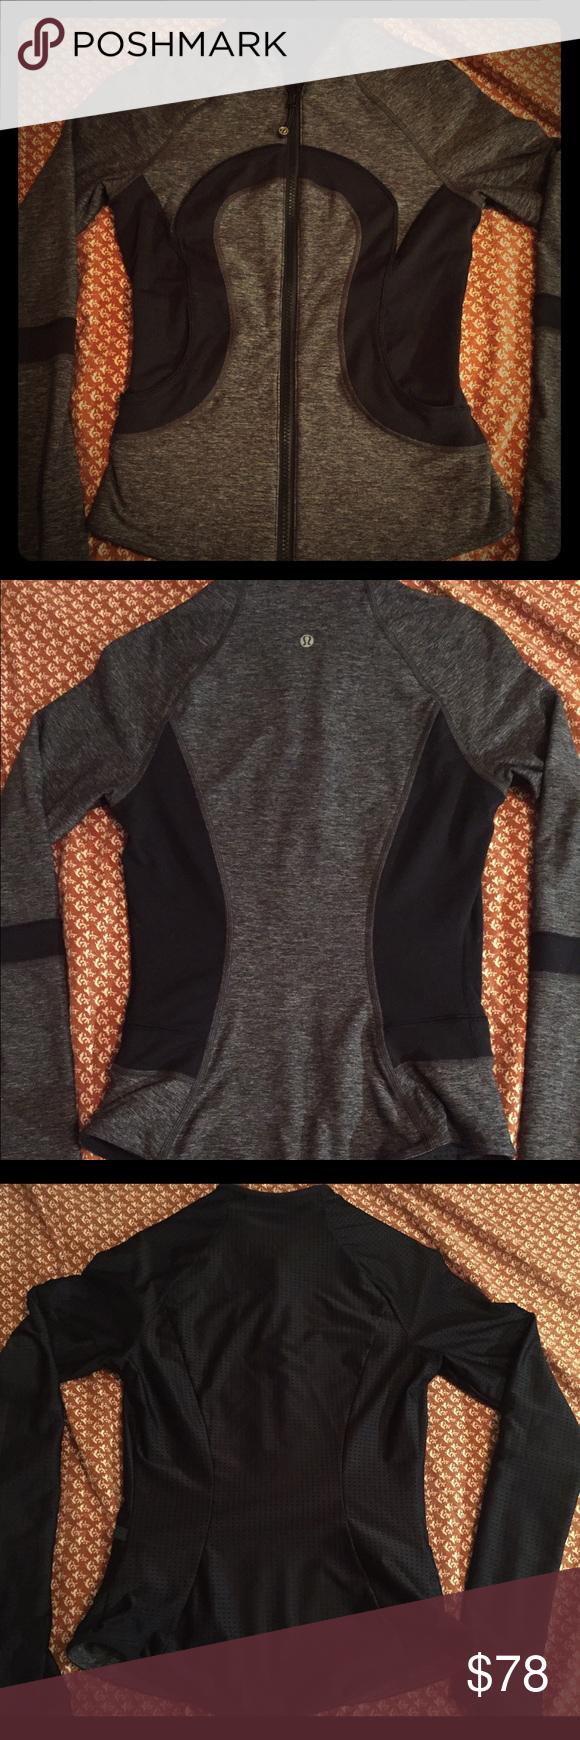 lululemon both way: black grey & mesh black jacket xs, barely worn, very comfy, too tight for me.. lululemon athletica Jackets & Coats